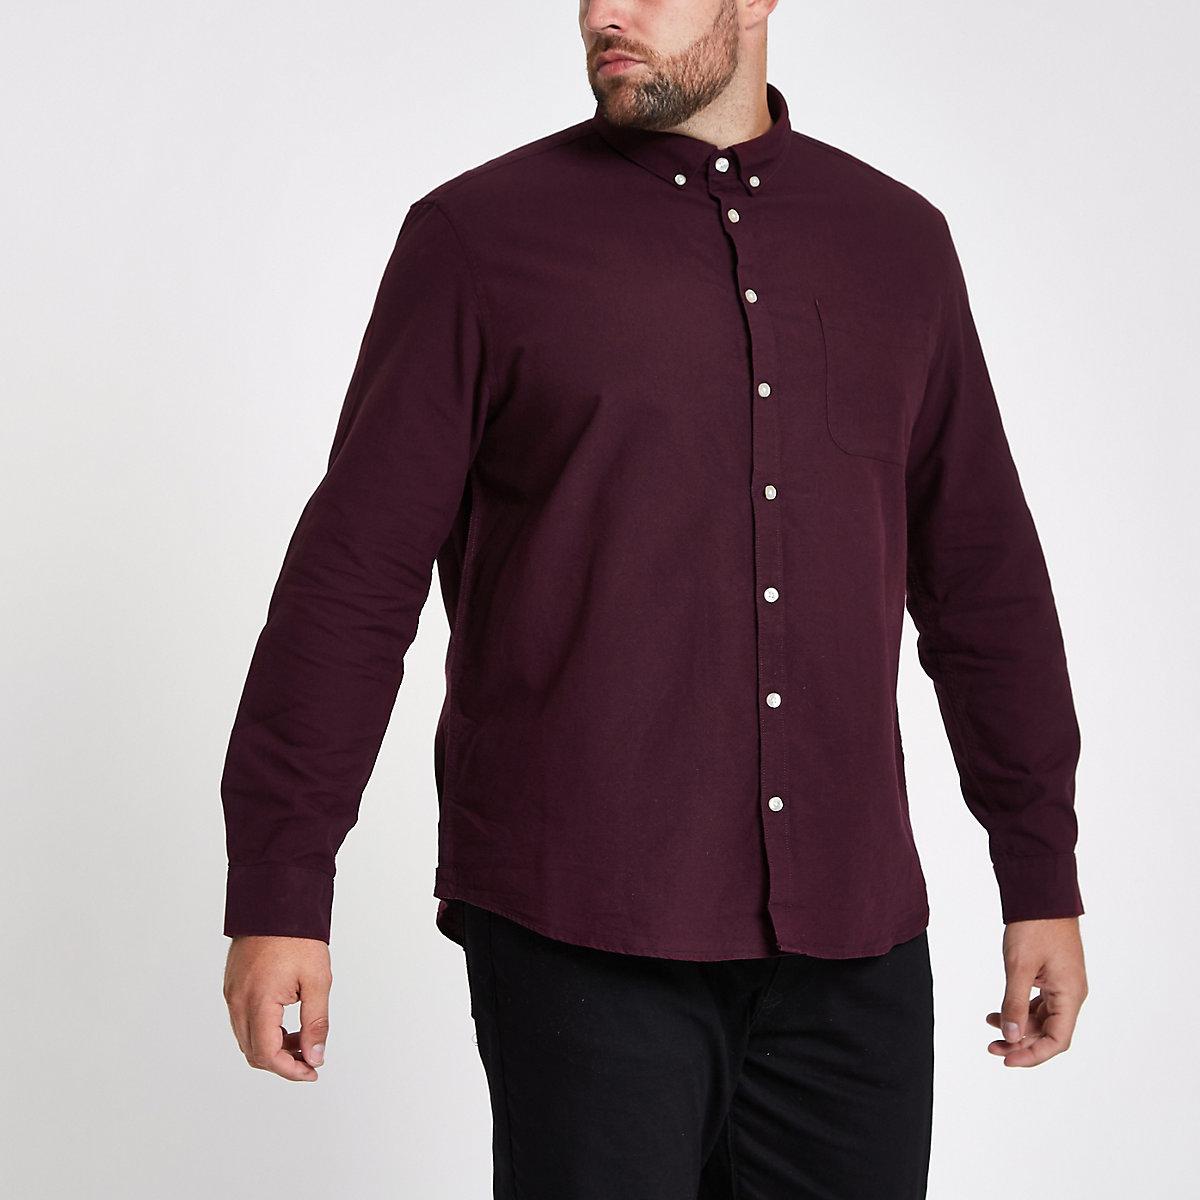 Big and Tall burgundy long sleeve shirt